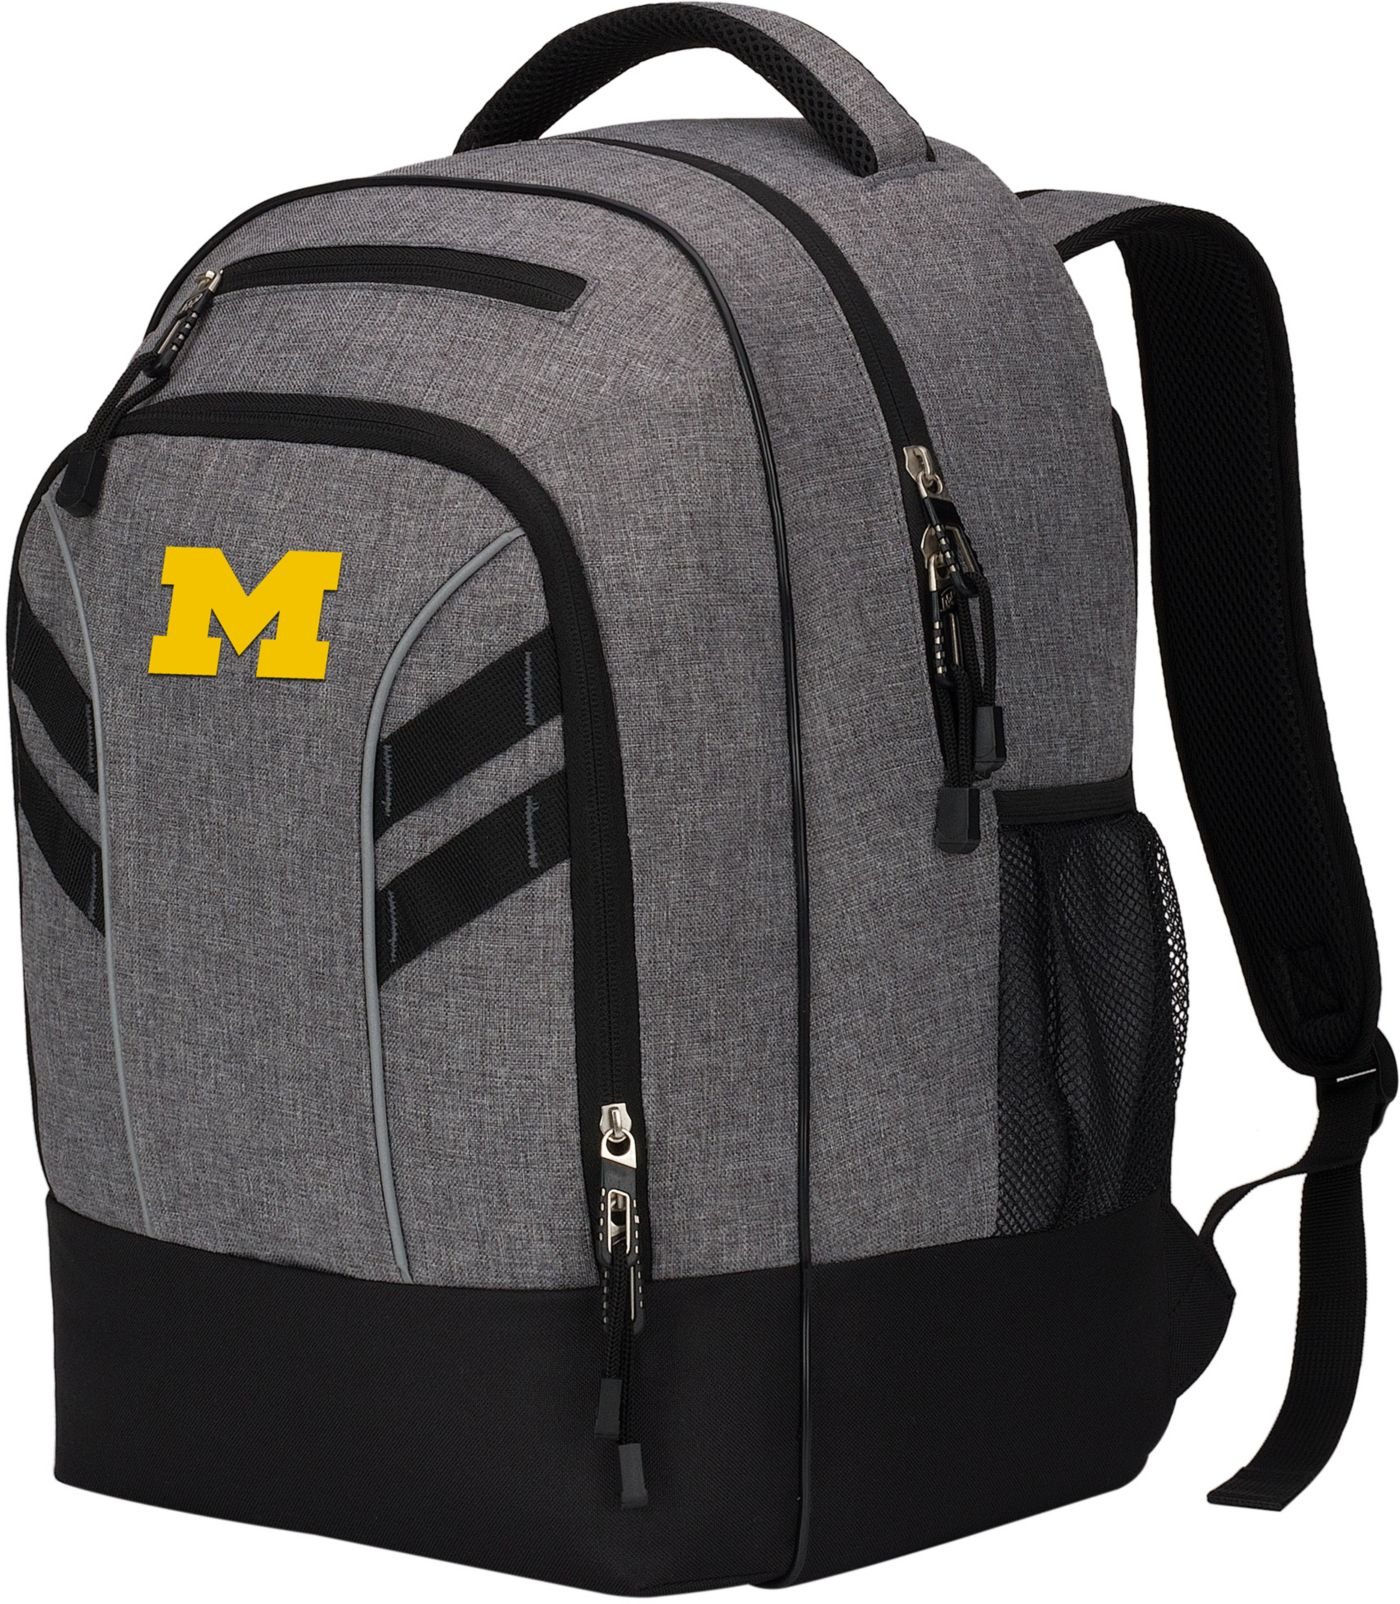 Northwest Michigan Wolverines Razor Backpack